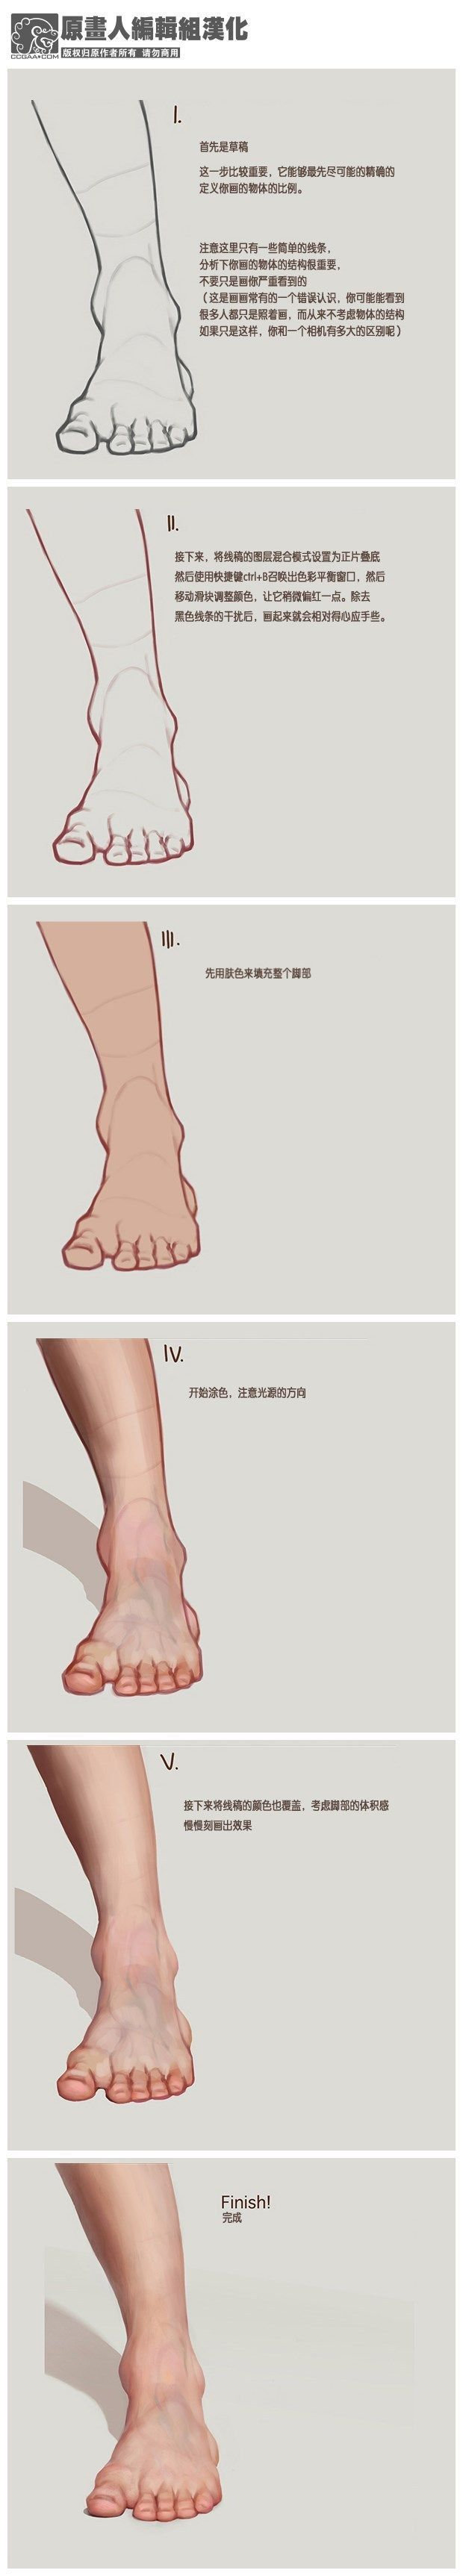 Foot Tutor_by Icecoldart_from DA (http://icecoldart.deviantart.com/) _from  [http://chuansong.me/n/1740266] _此圖為原畫人編輯組私自翻譯版本